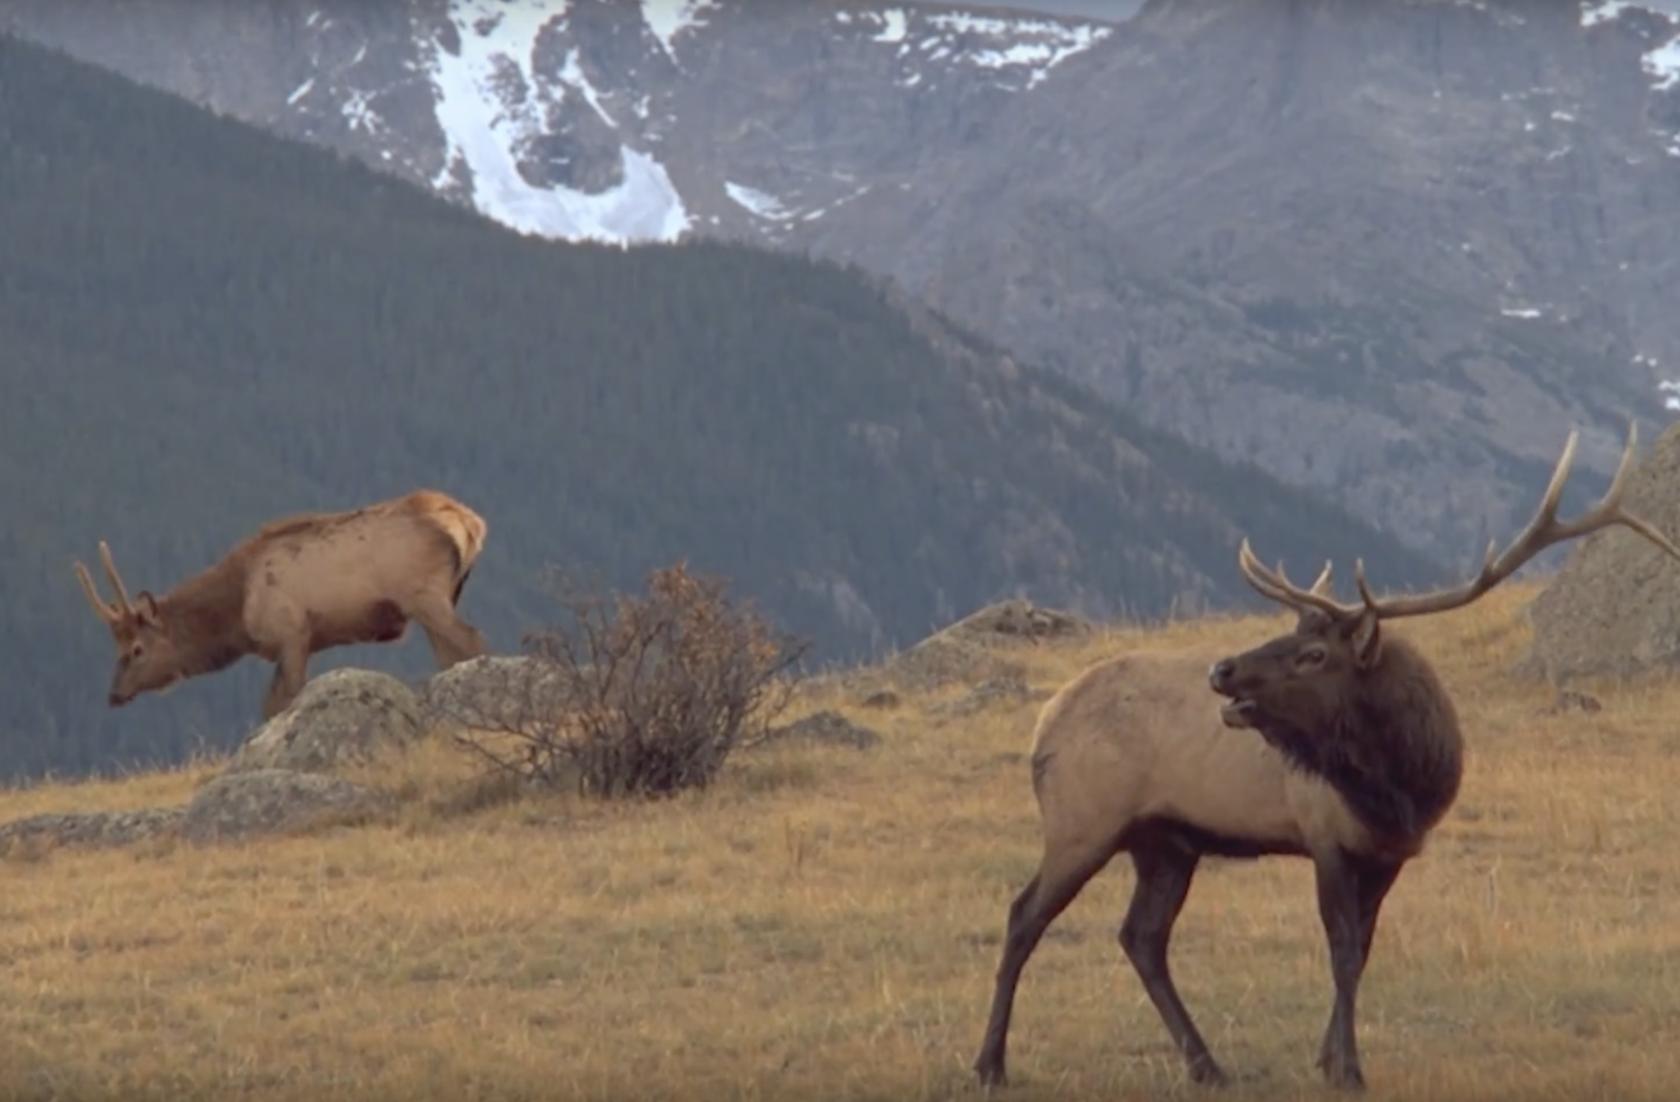 Elk grazing on grass